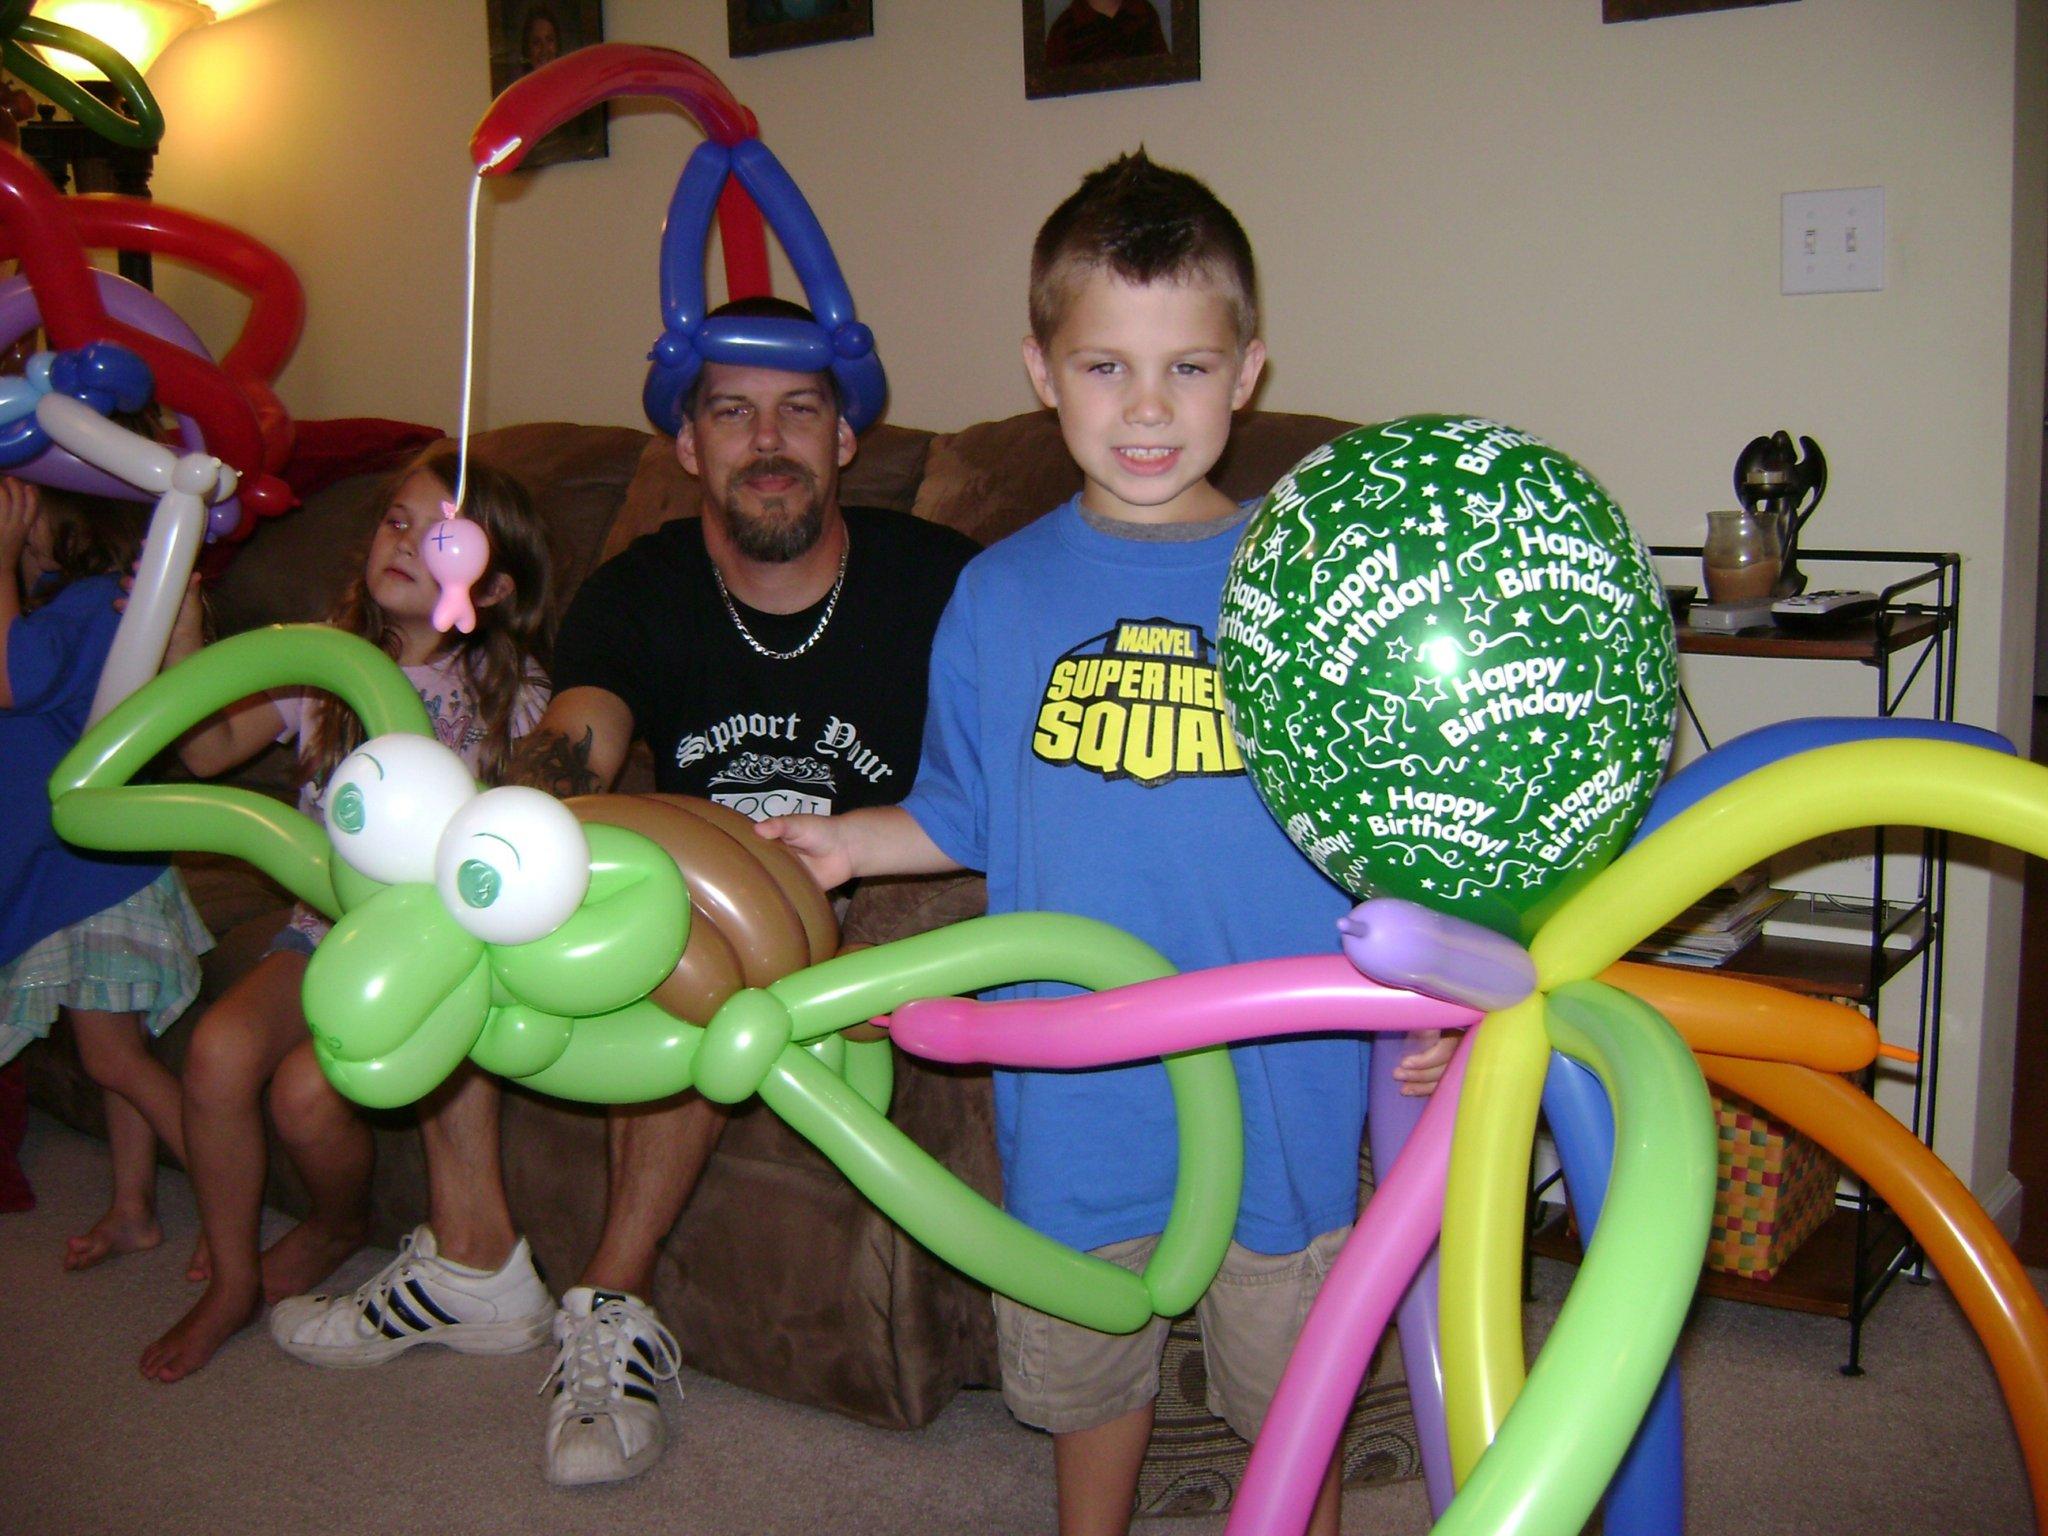 Who Gets A Balloon?